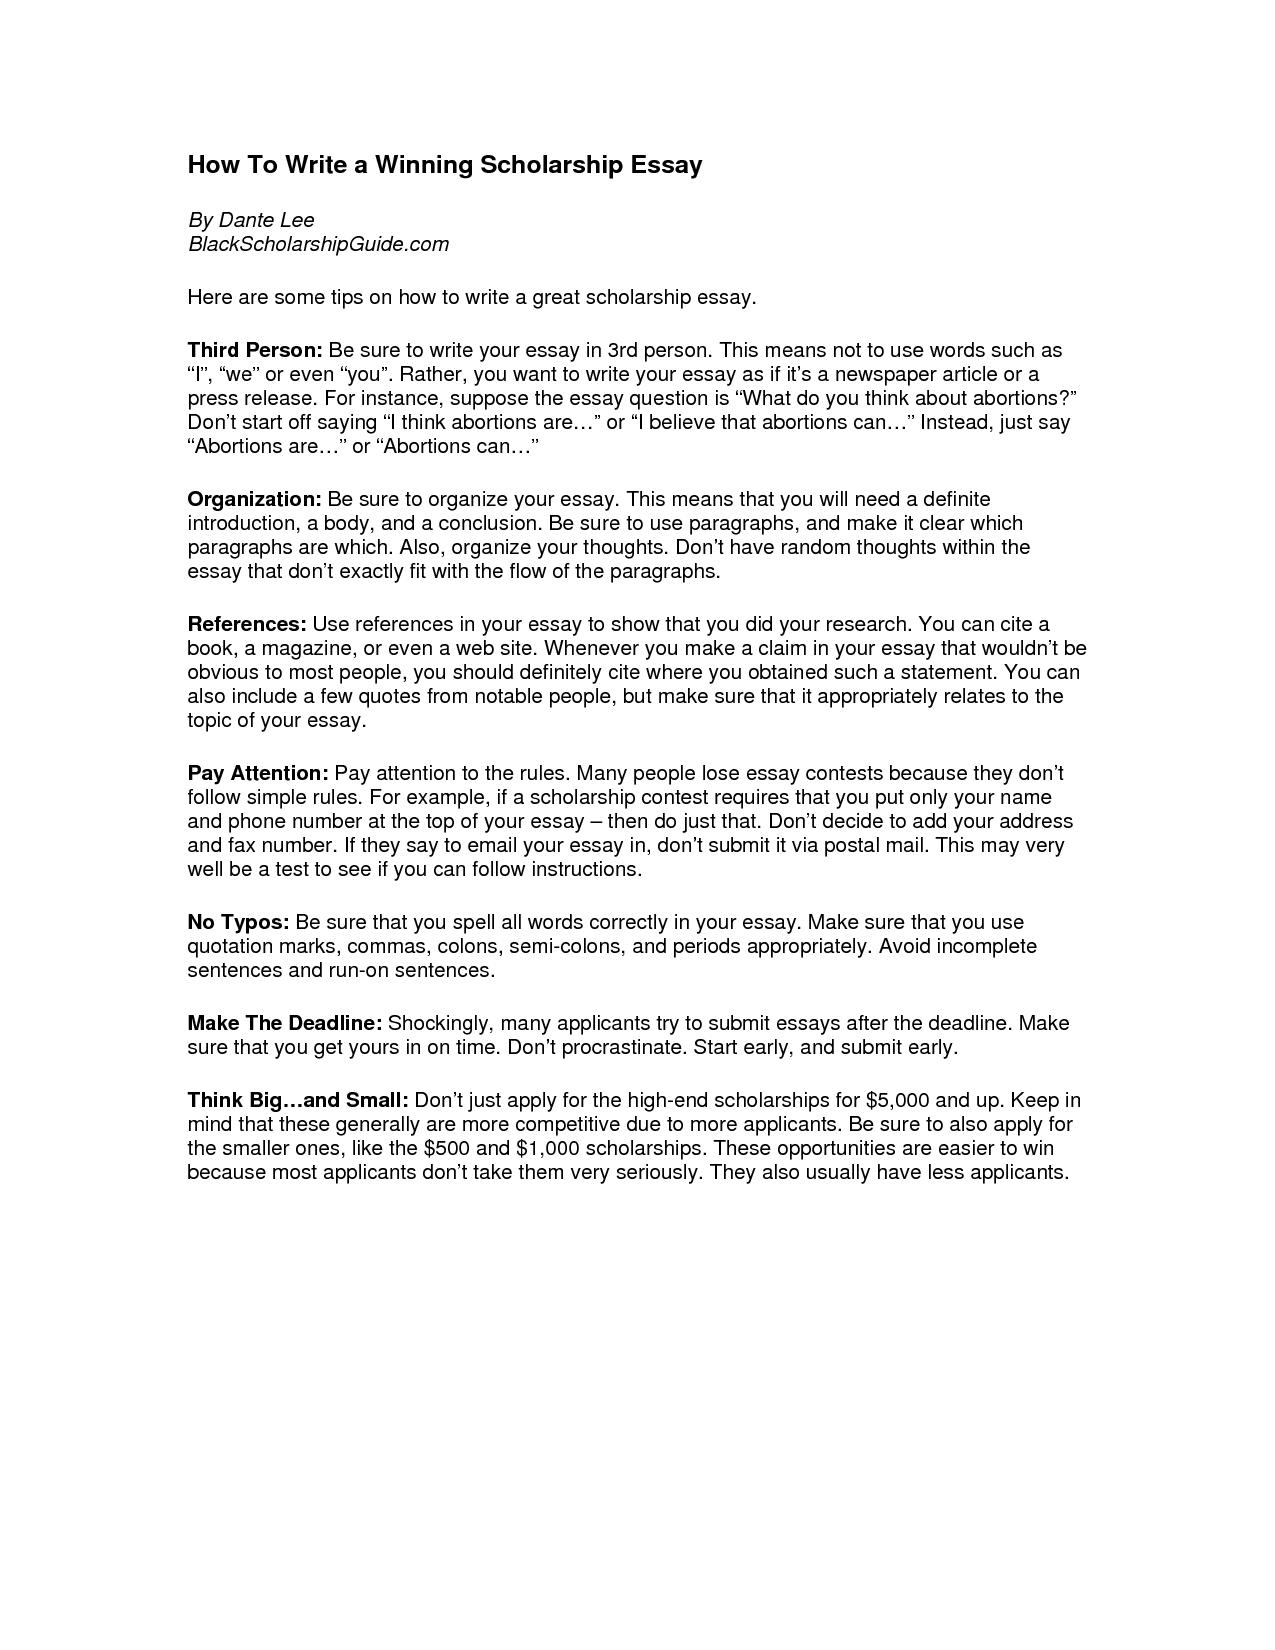 008 Zmemxteu5z Example Scholarships Phenomenal Scholarship Essays Sample For Masters 500 Words Nursing Full